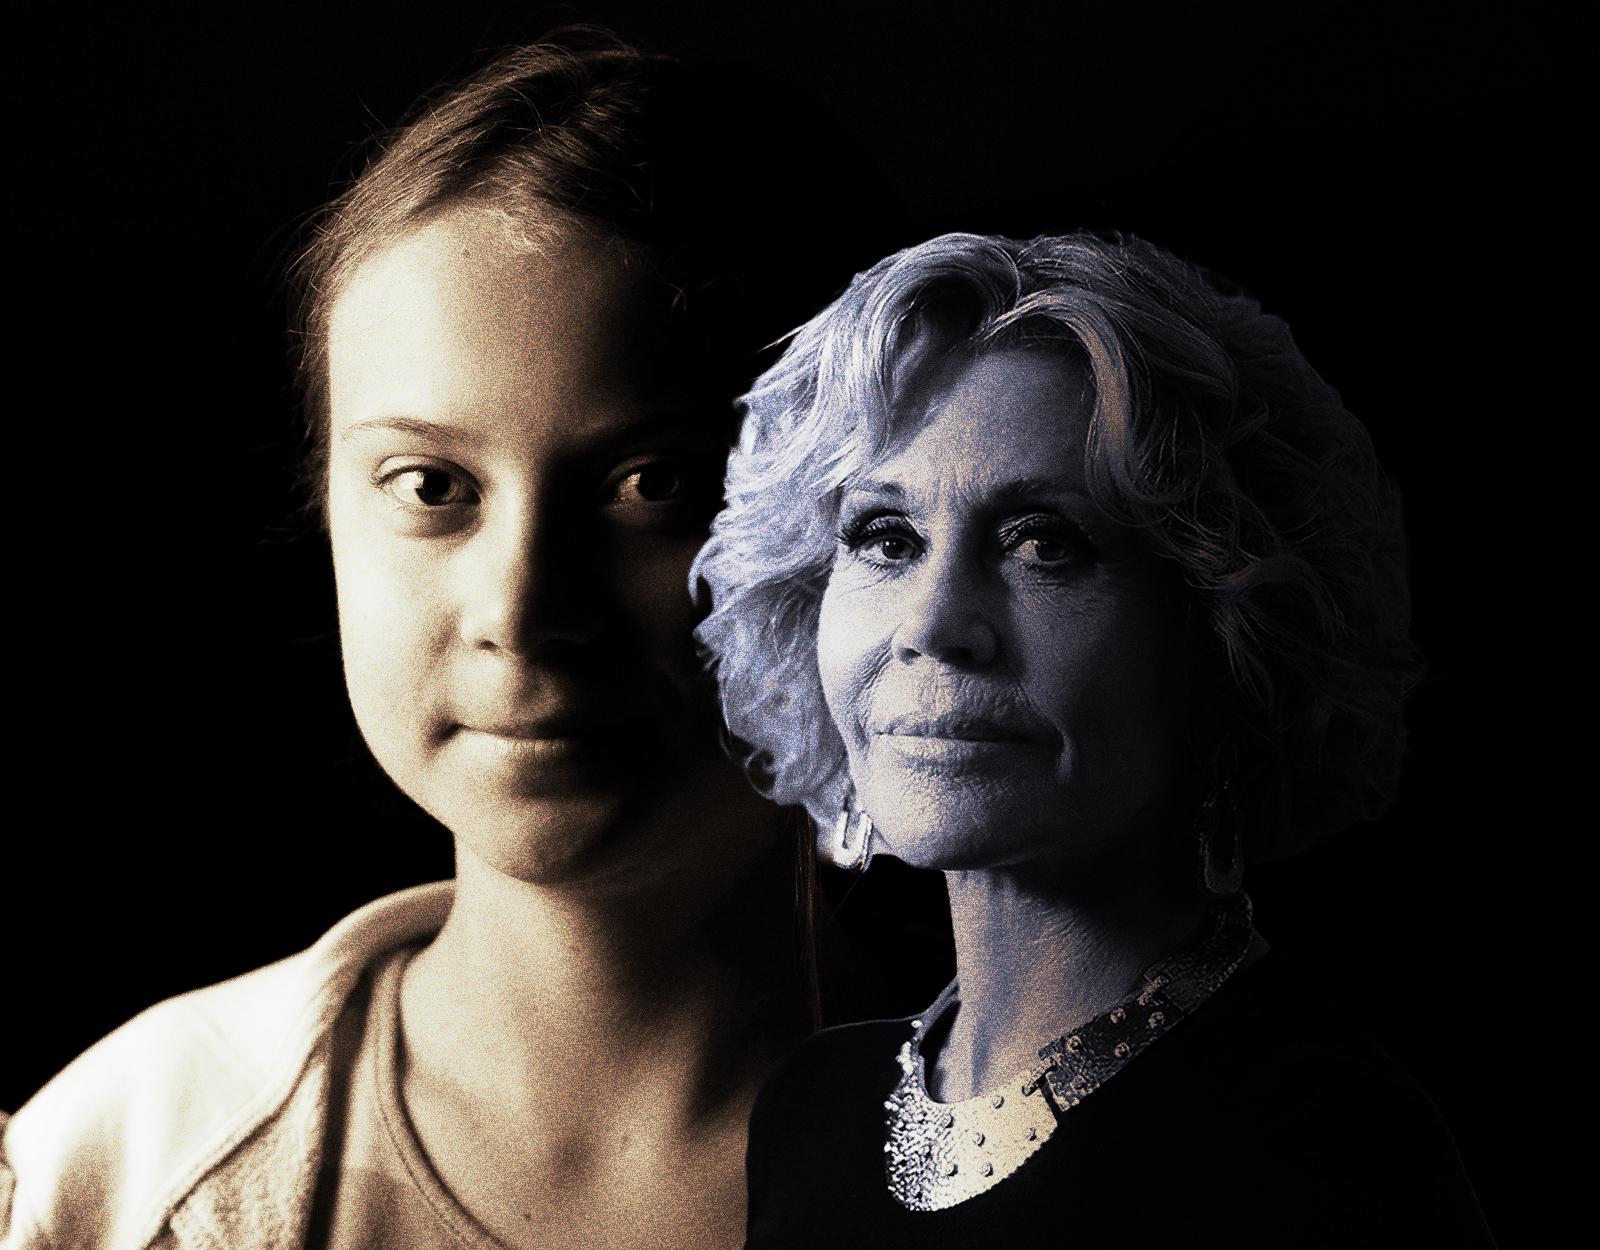 Jane Fonda Arrested in Latest Political Stunt